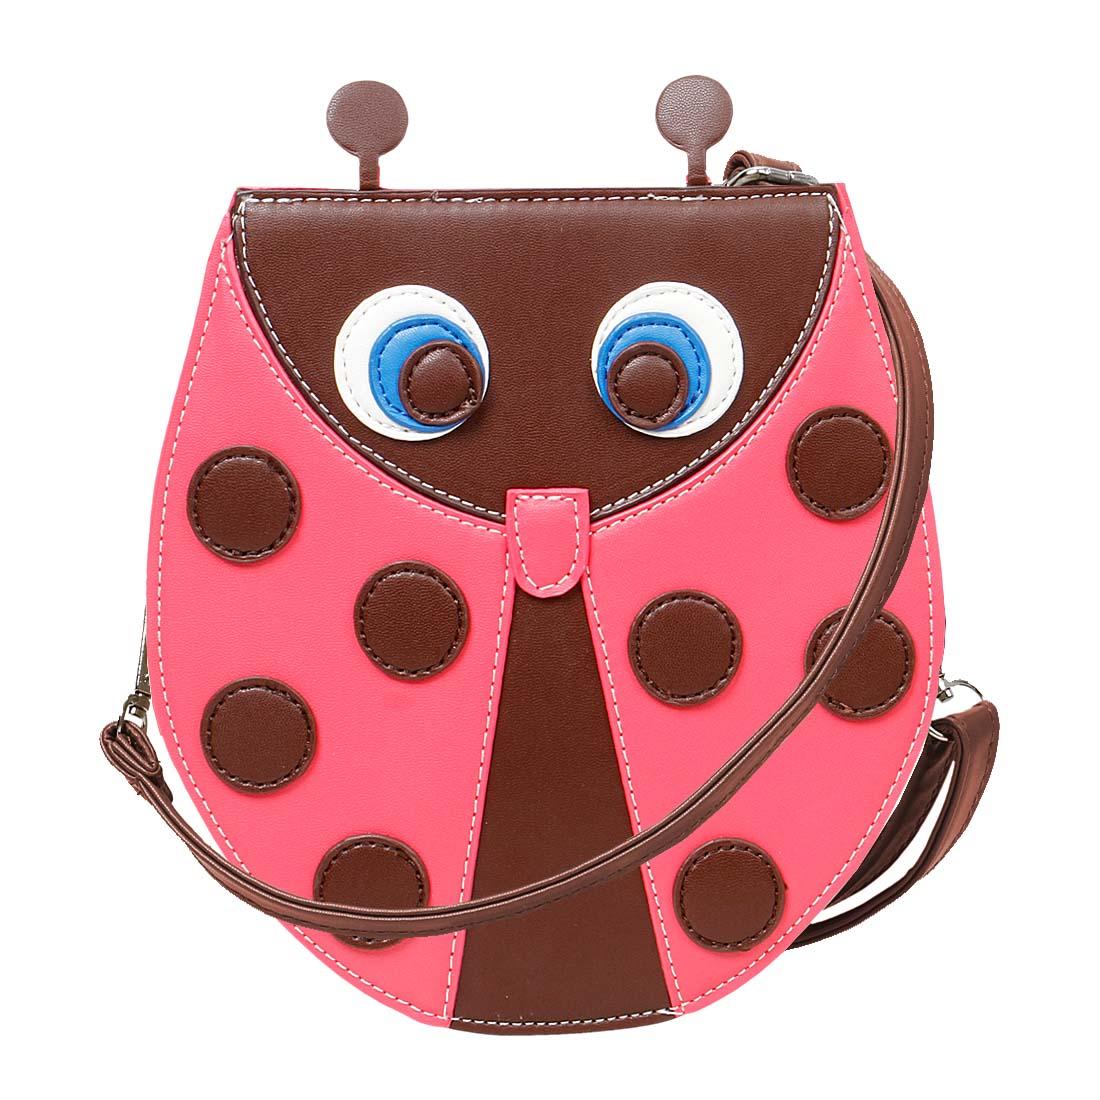 BMC PU Leather Cute Ladybug Shaped Shoulder Purse Clutch ...